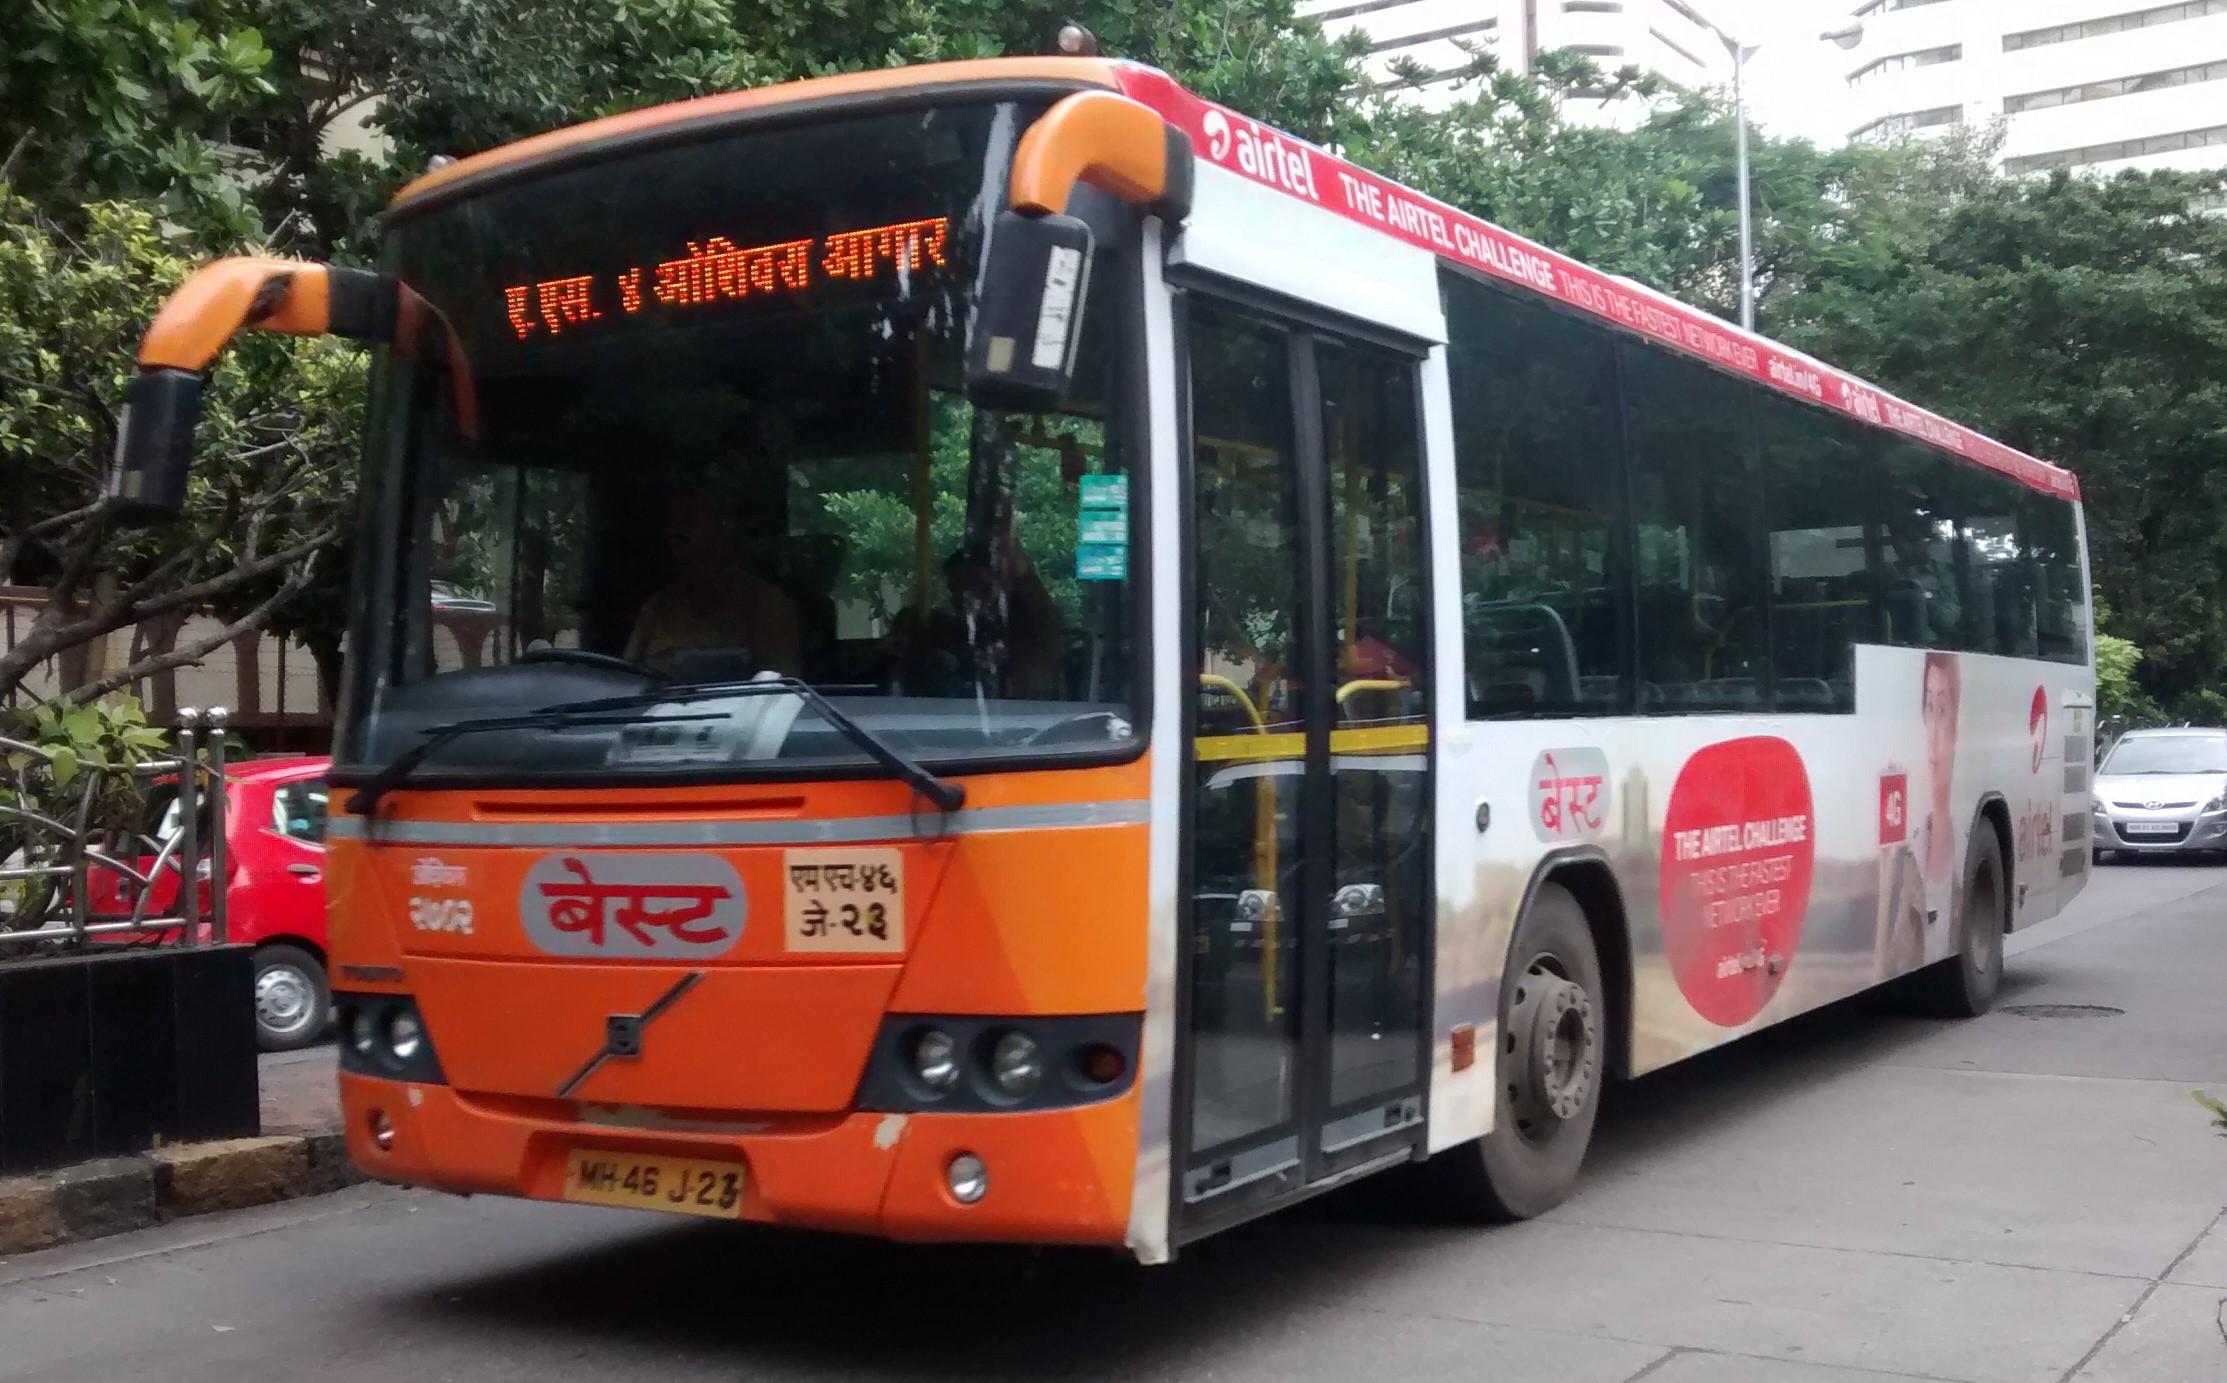 Palm Beach Bus Transportation